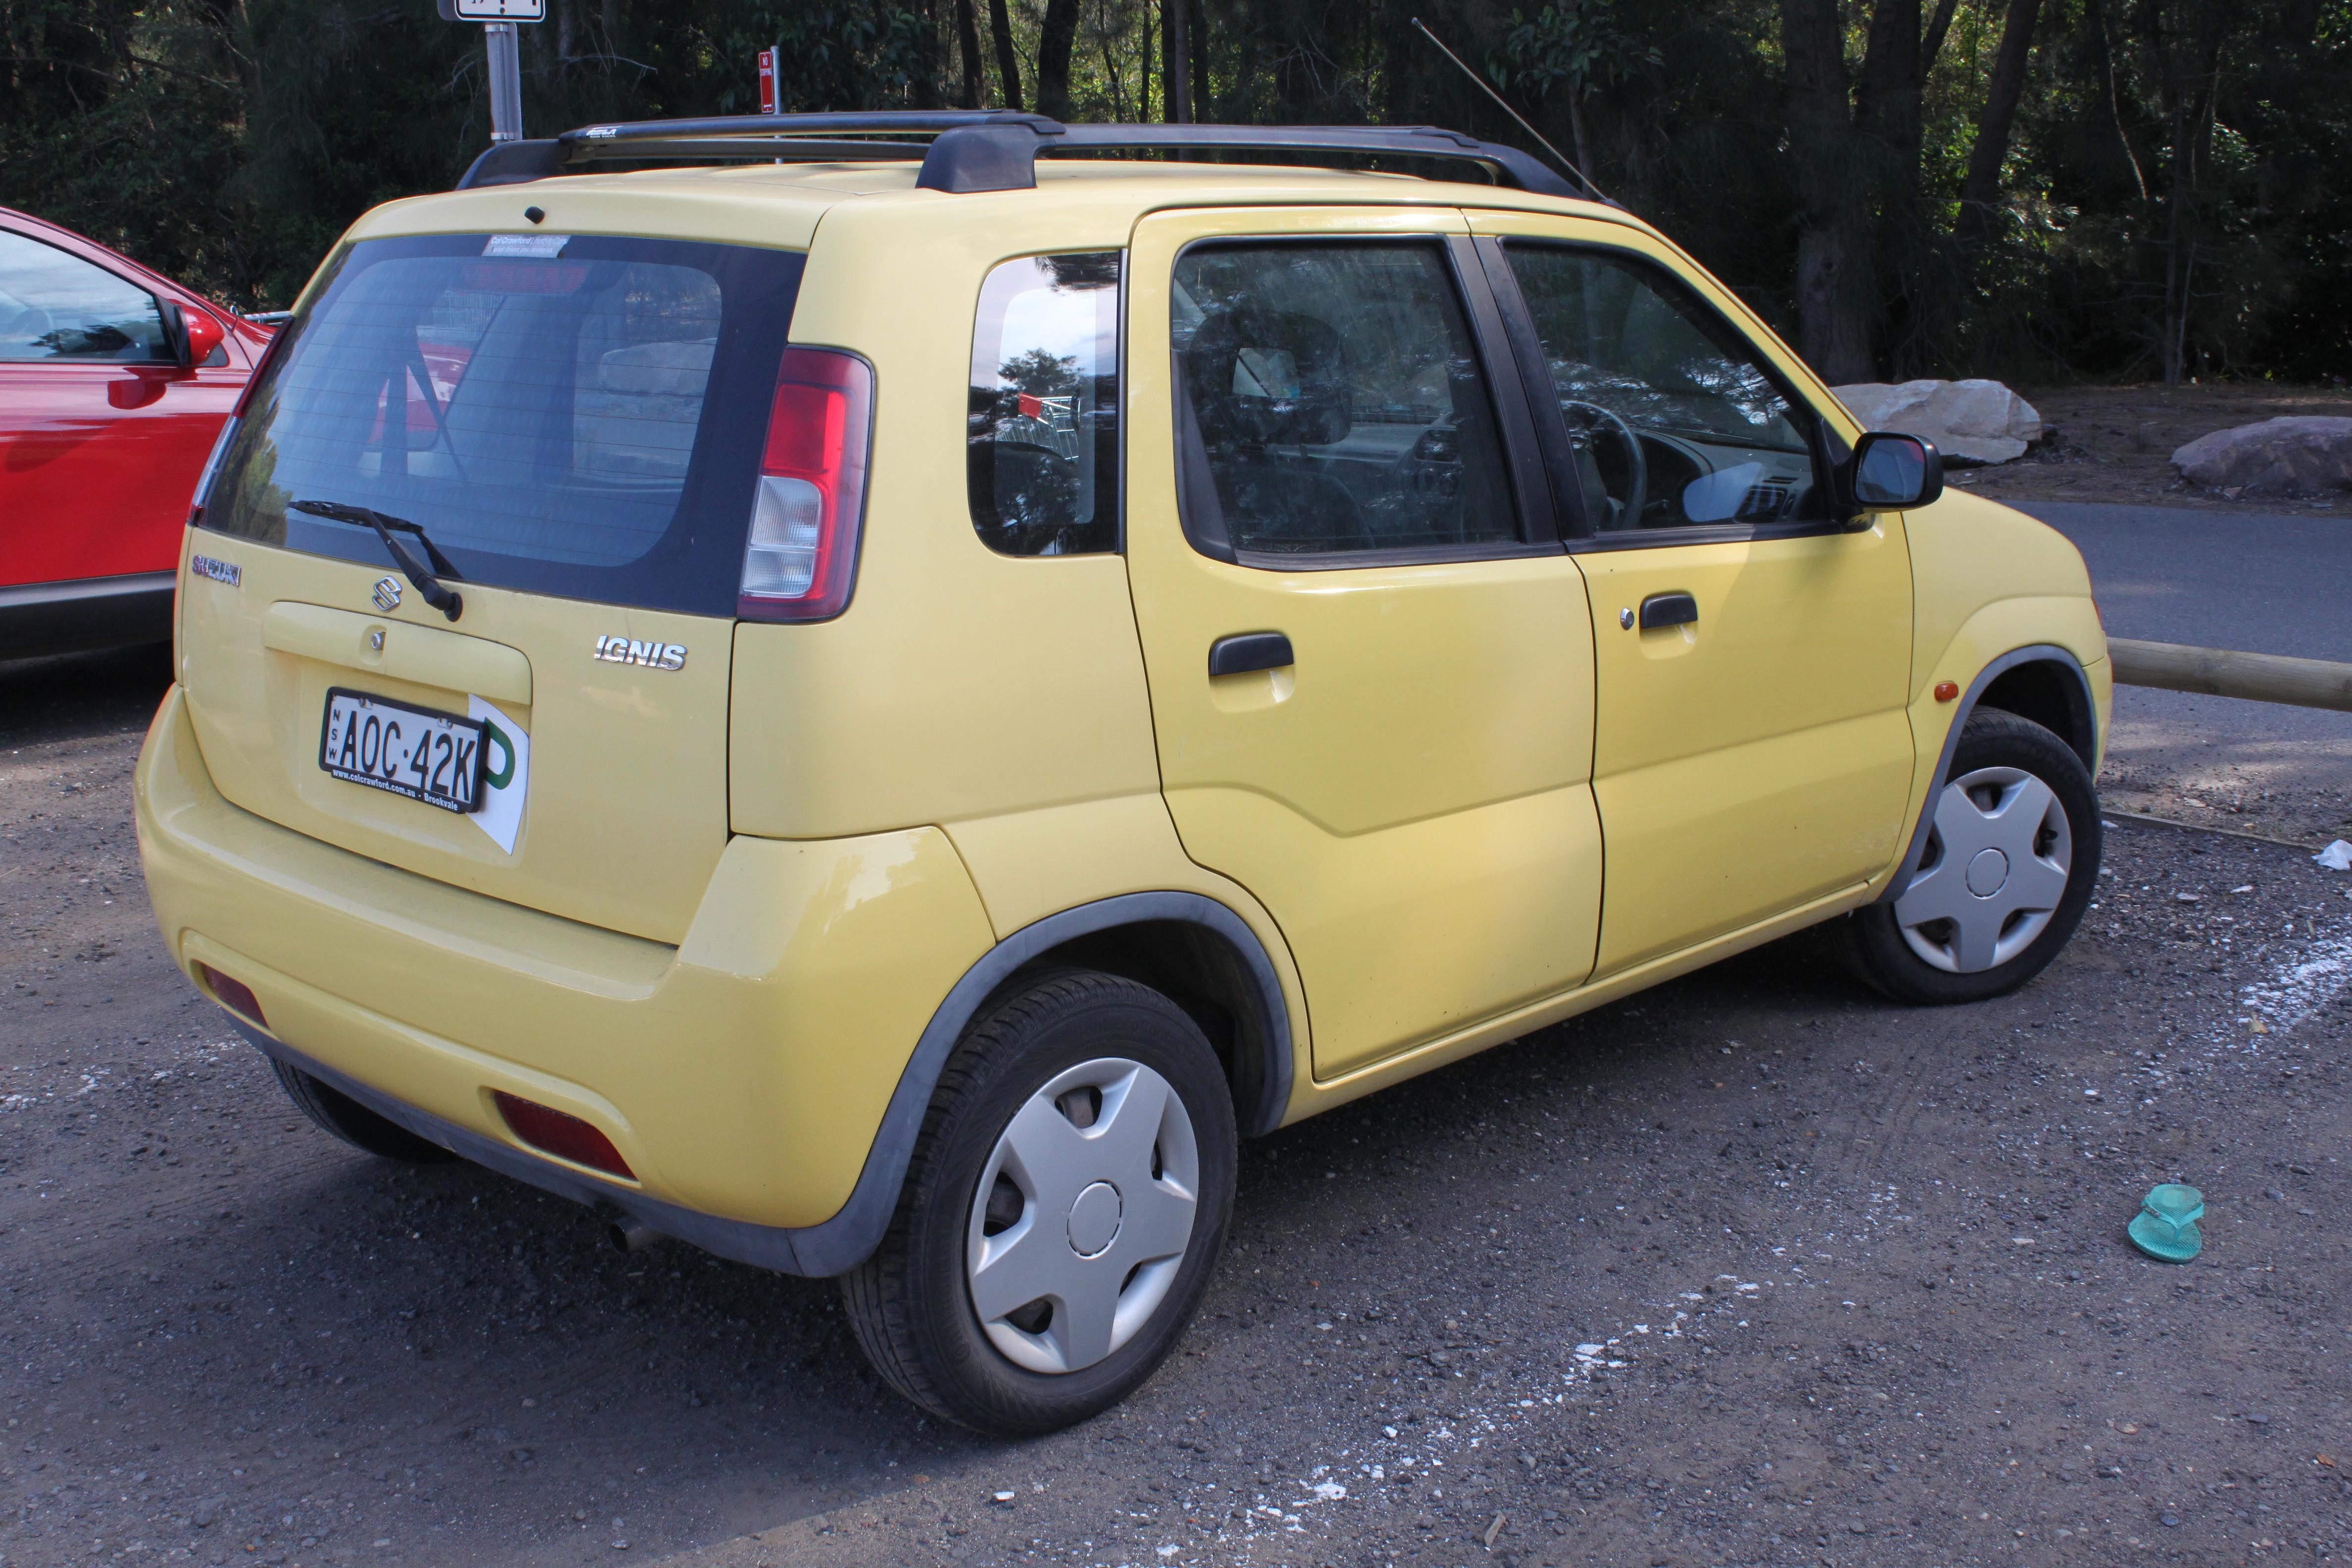 Small City Cars & Hatchbacks | Suzuki Cars UK